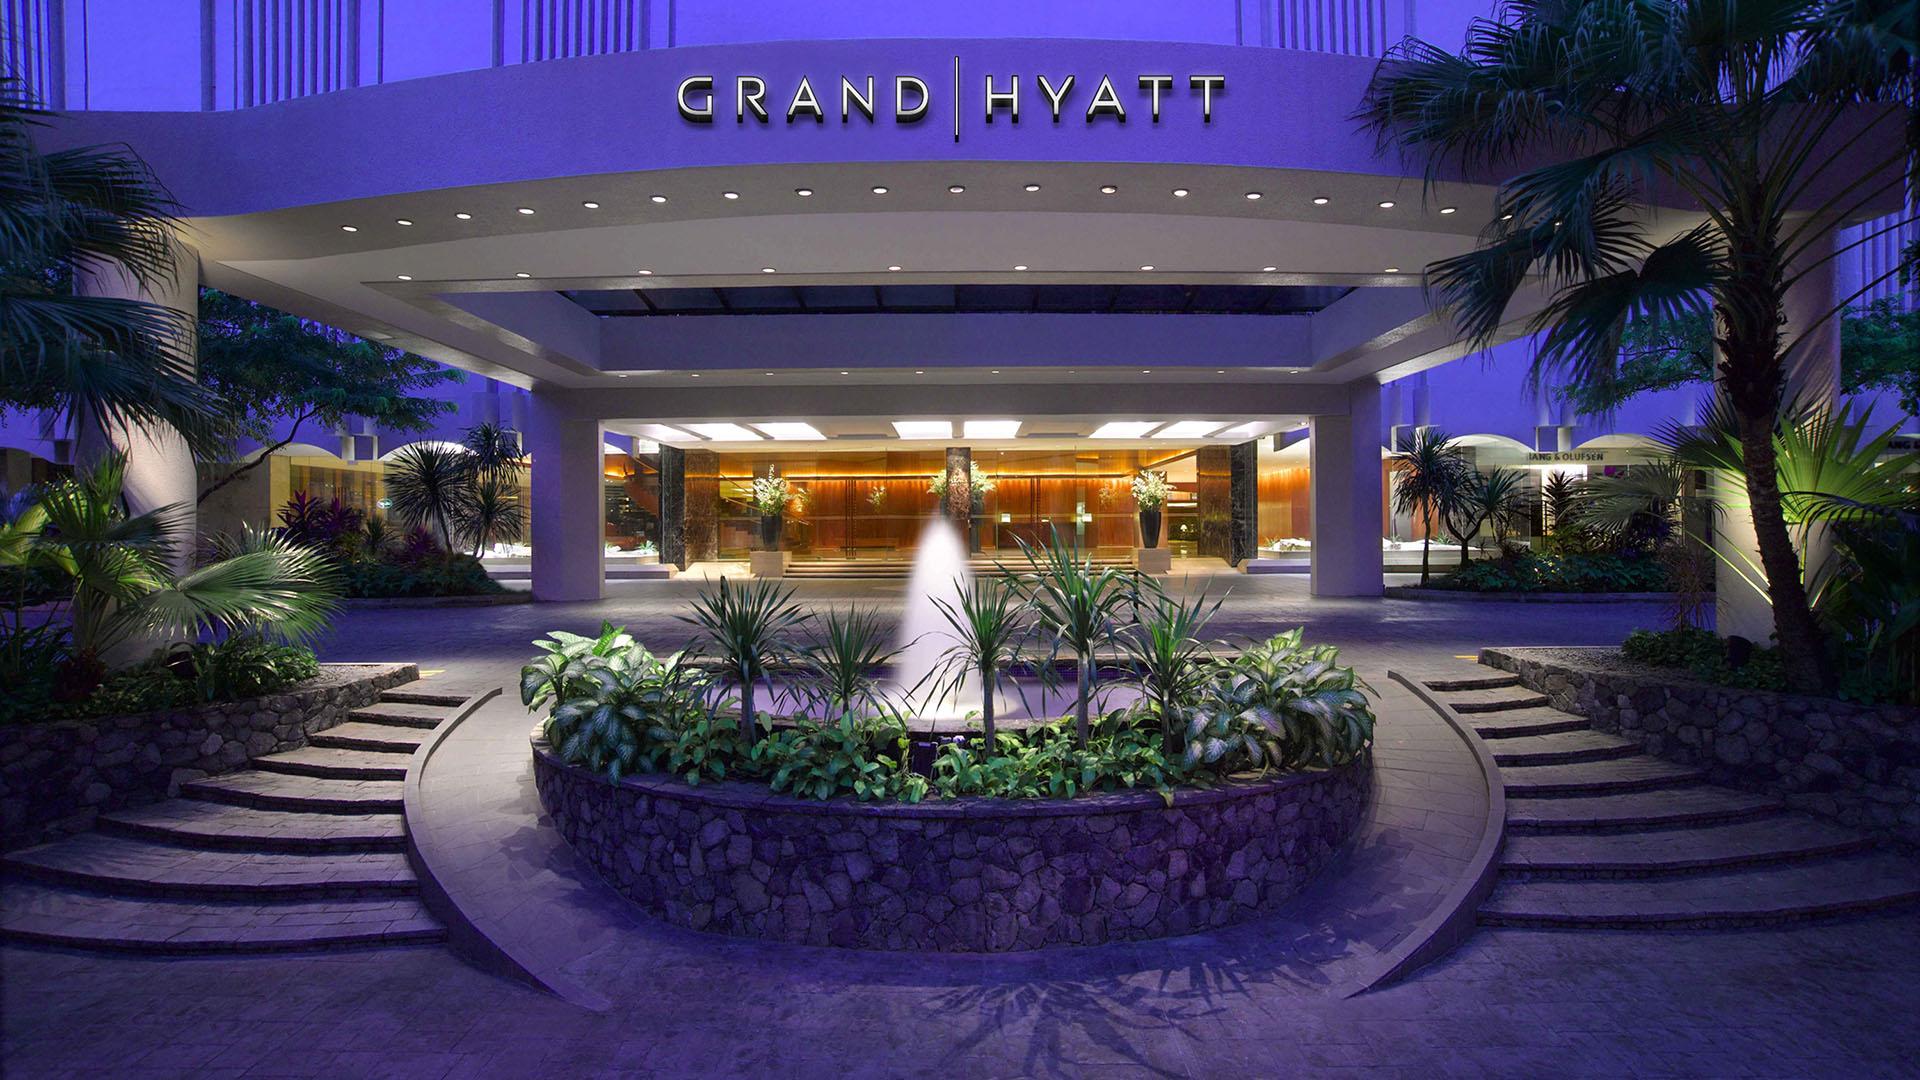 MEIKO Grand hyatt Singapur